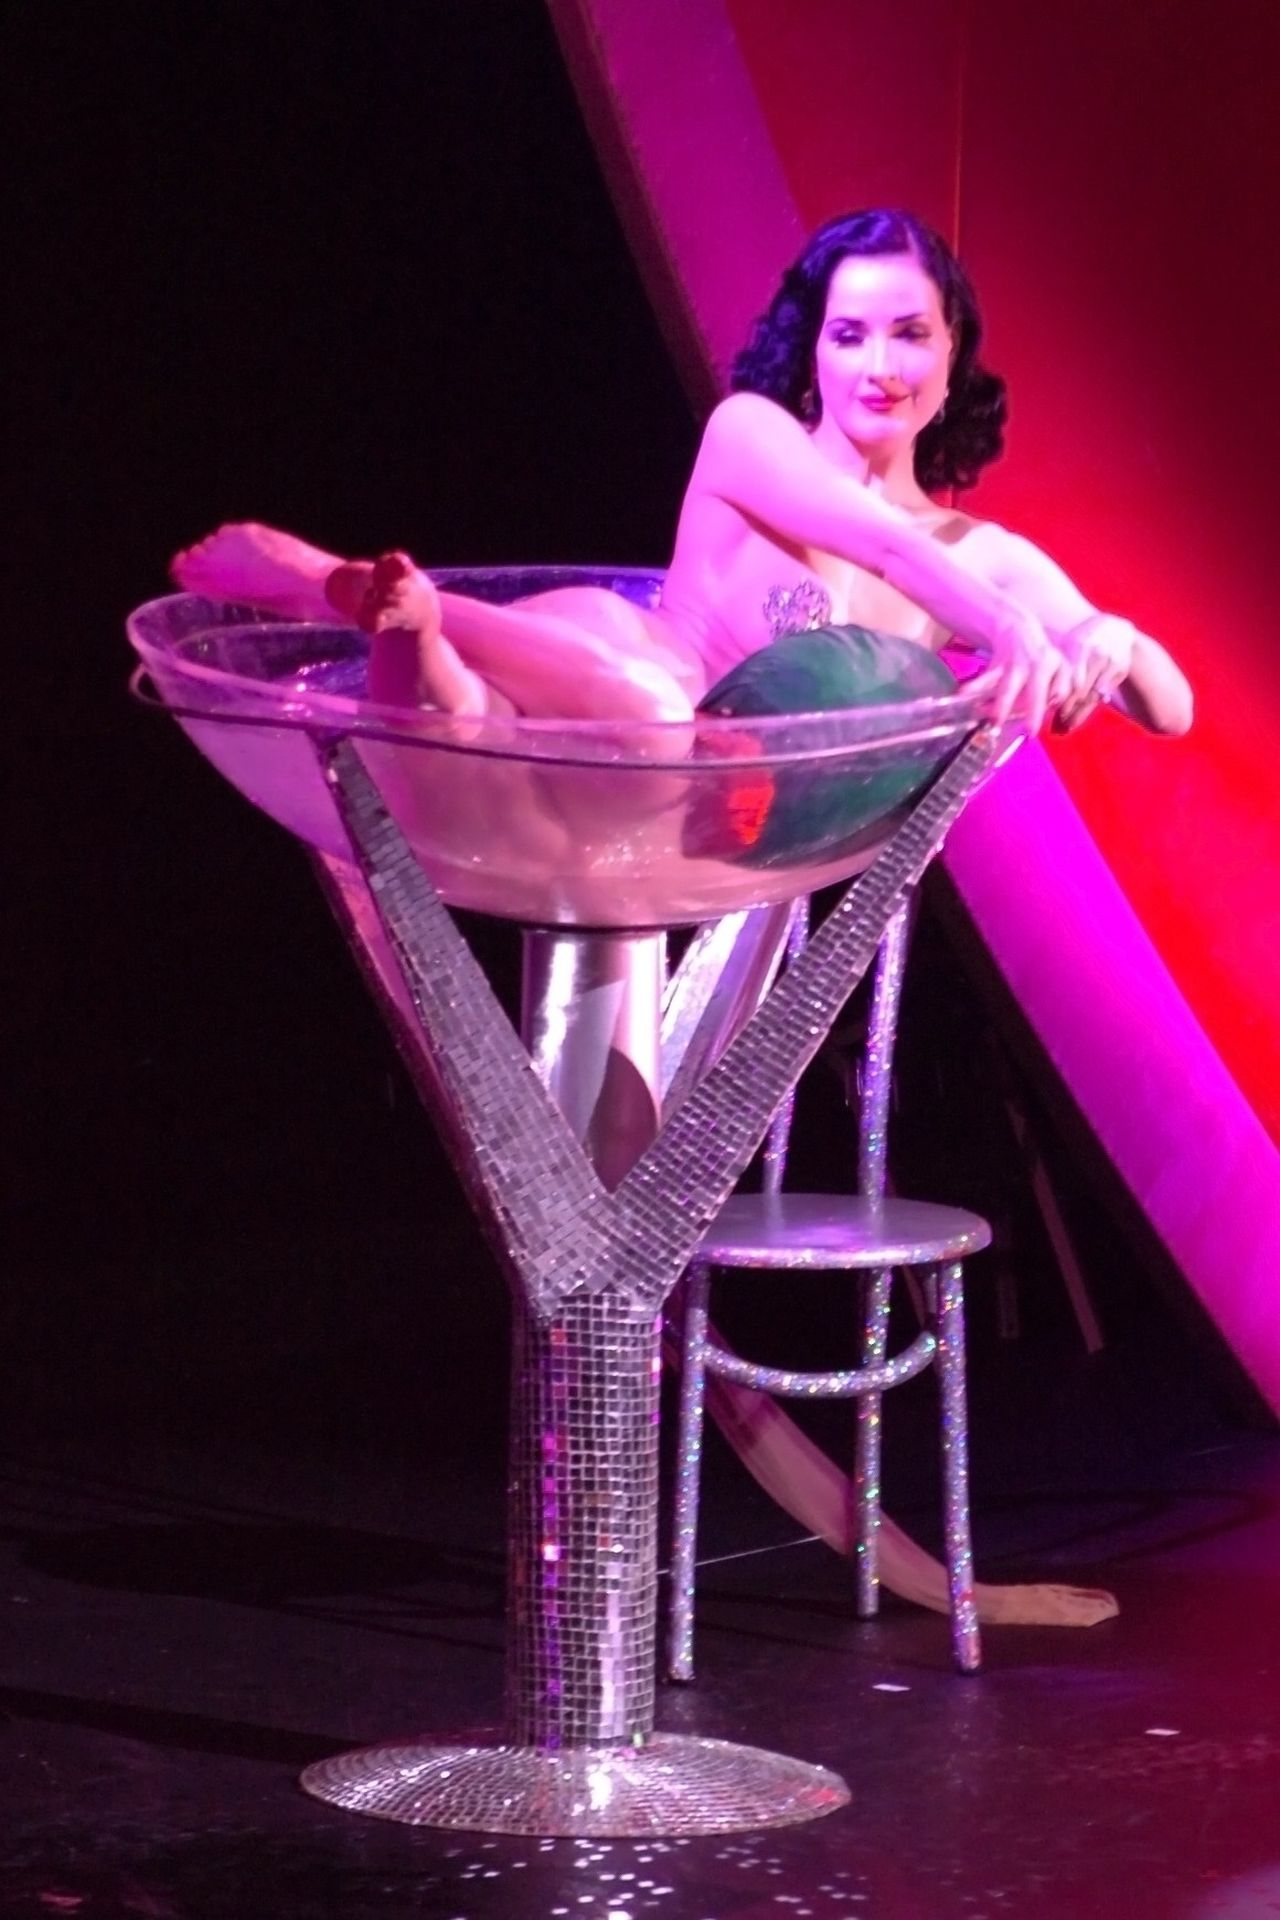 Dita Von Teese Performs At Erotica 06 In London 0025